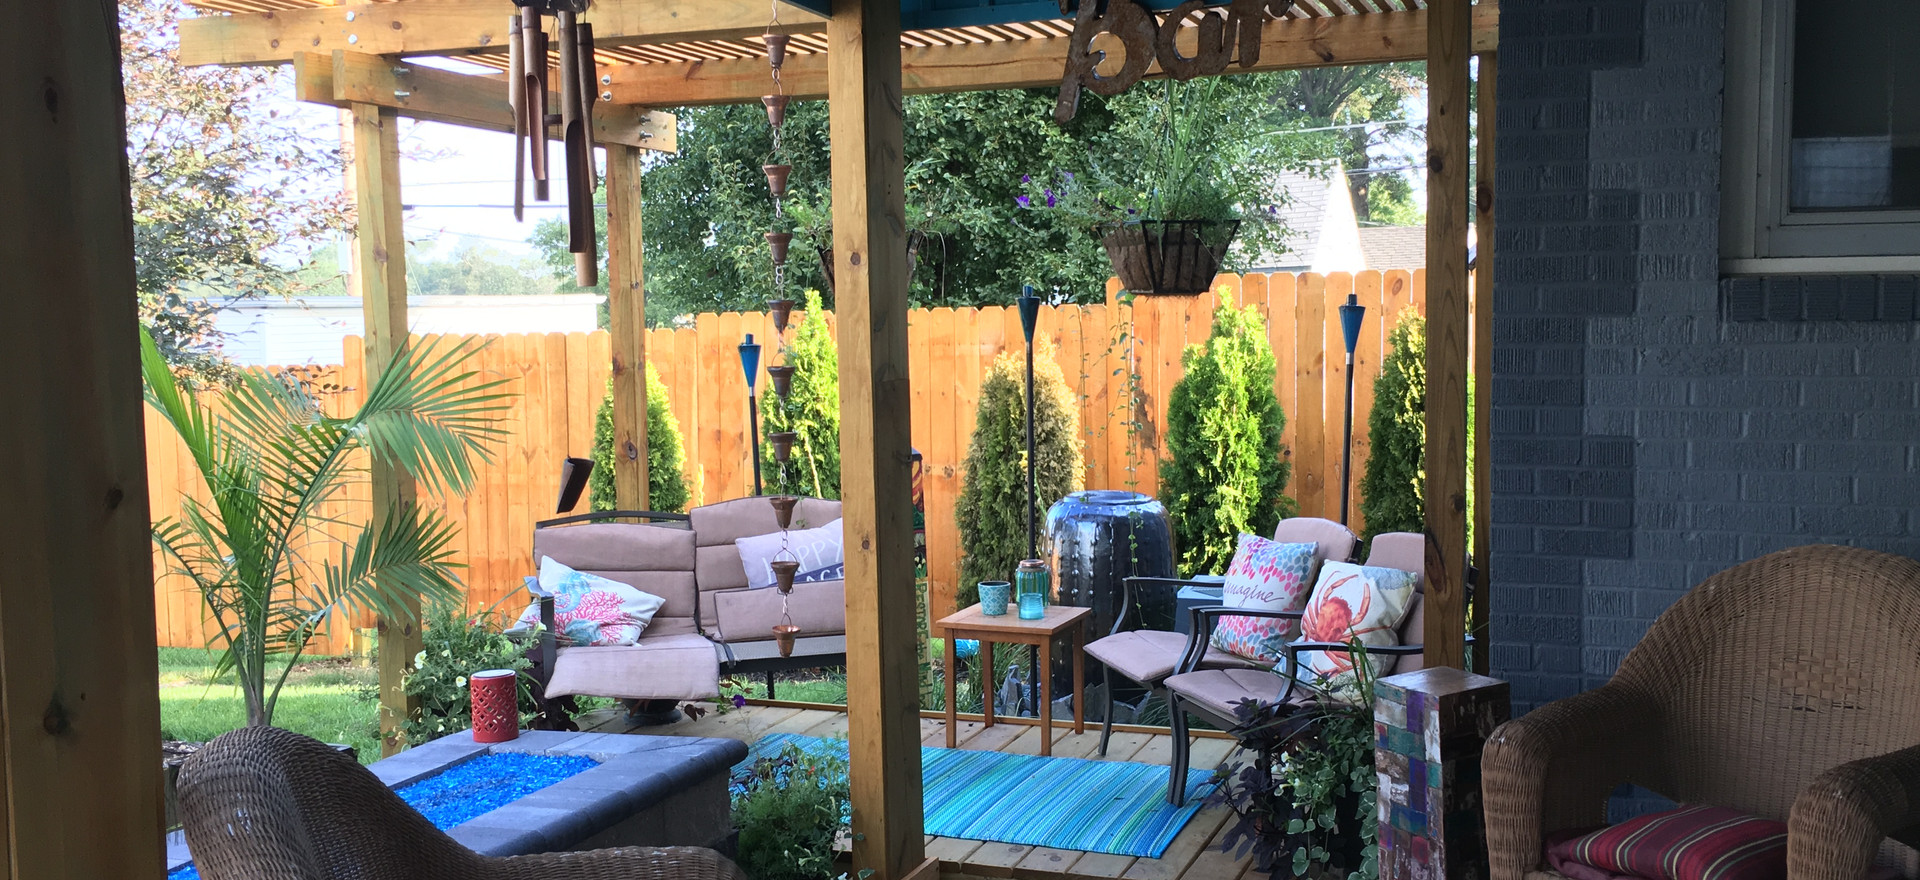 Huge bonus for this backyard!